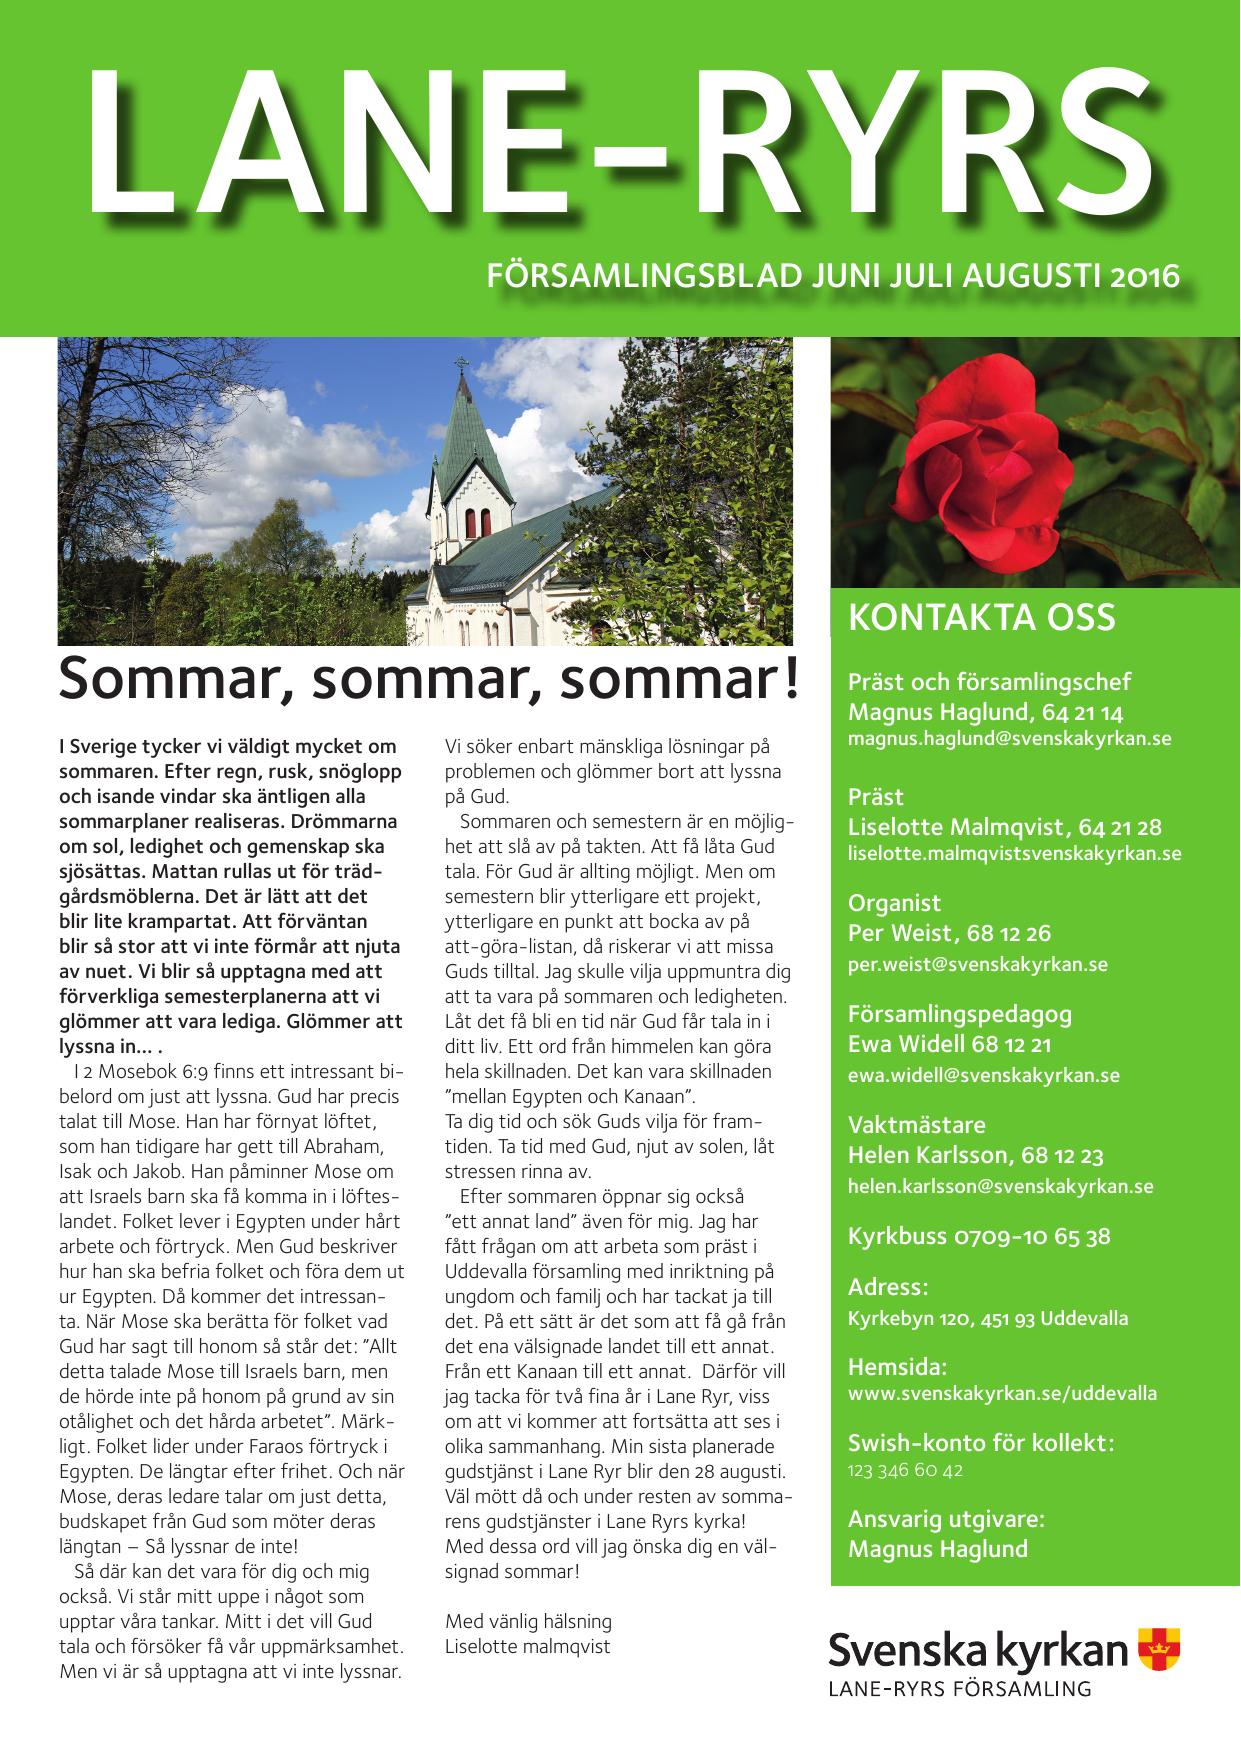 Lediga jobb fr Kvll i Lane-Ryr | unam.net